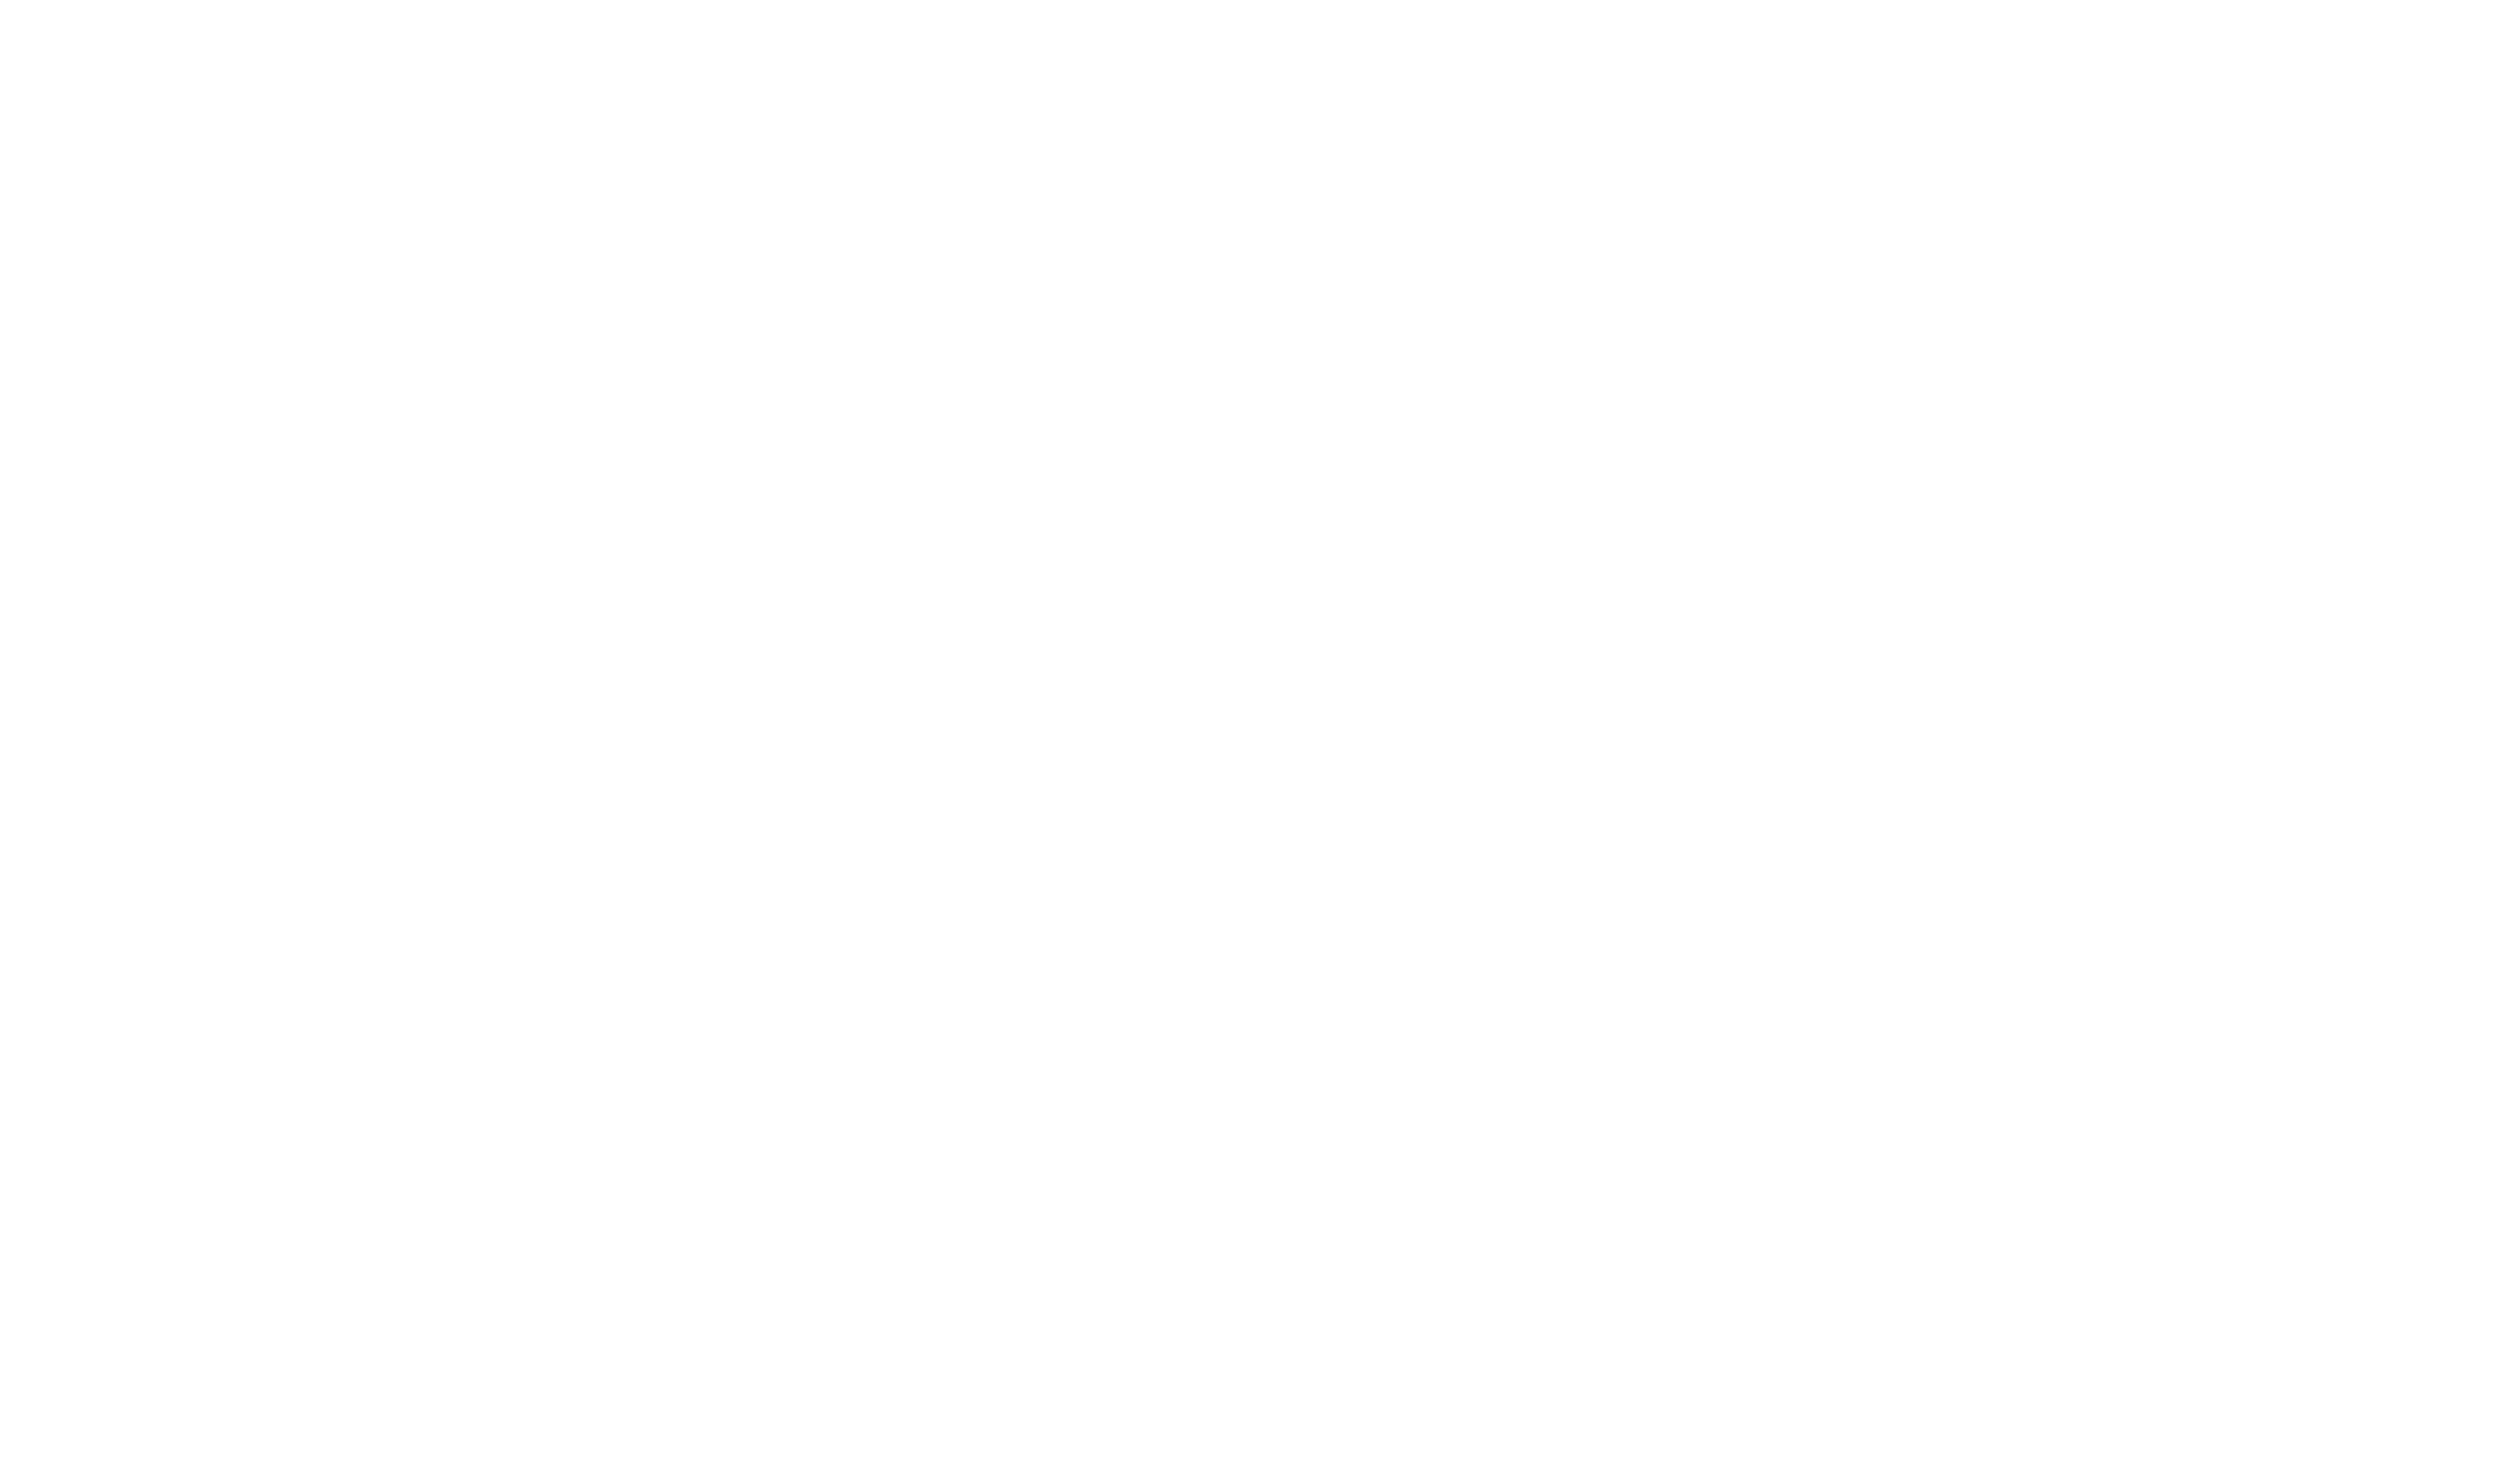 Darlan Aranha - Fotógrafo